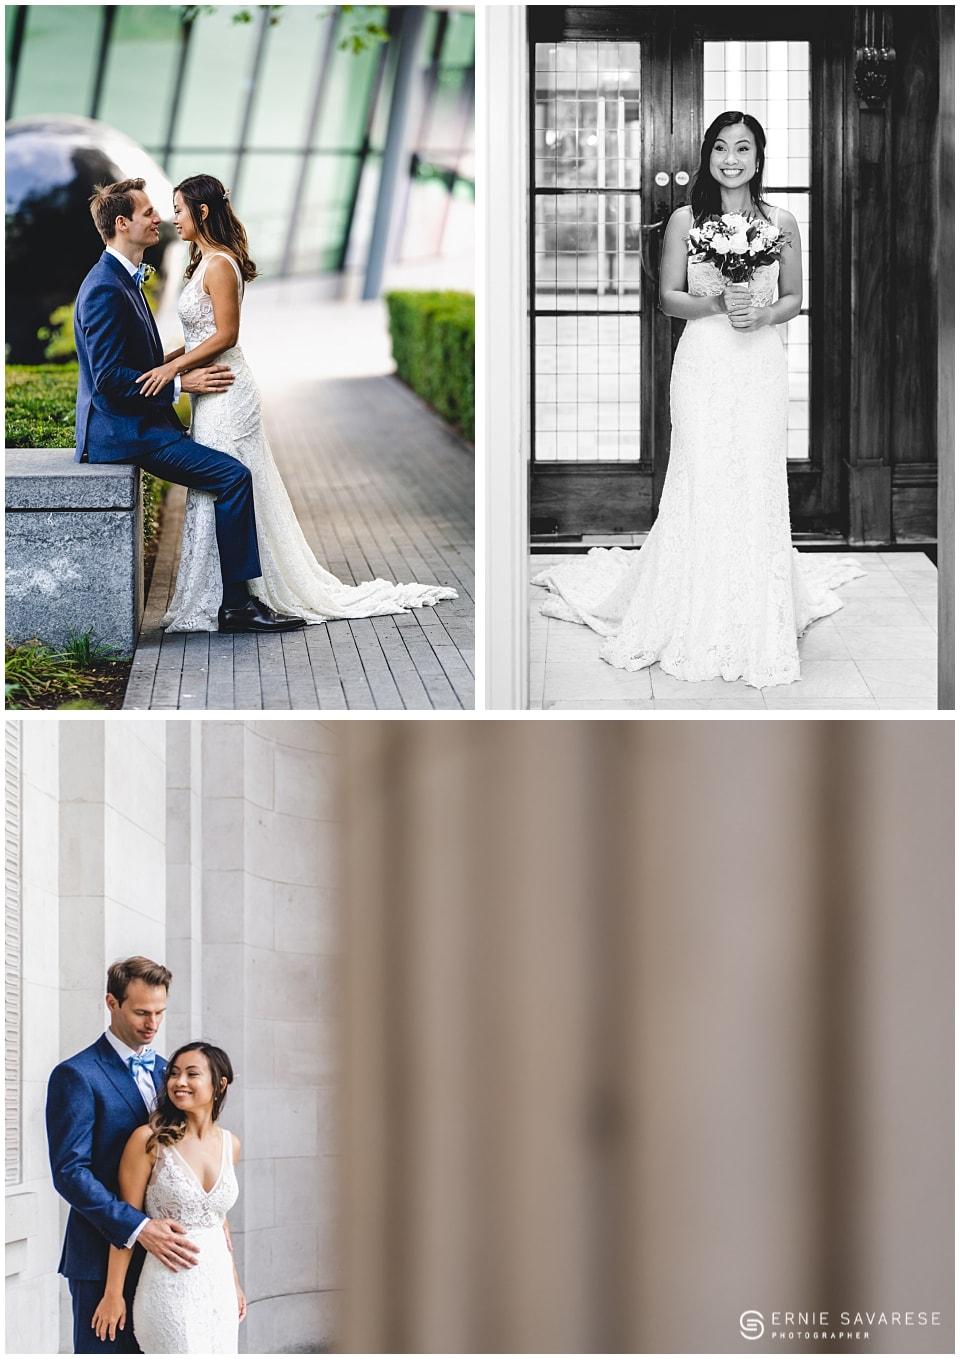 London Wedding Photographer Ernie Savarese